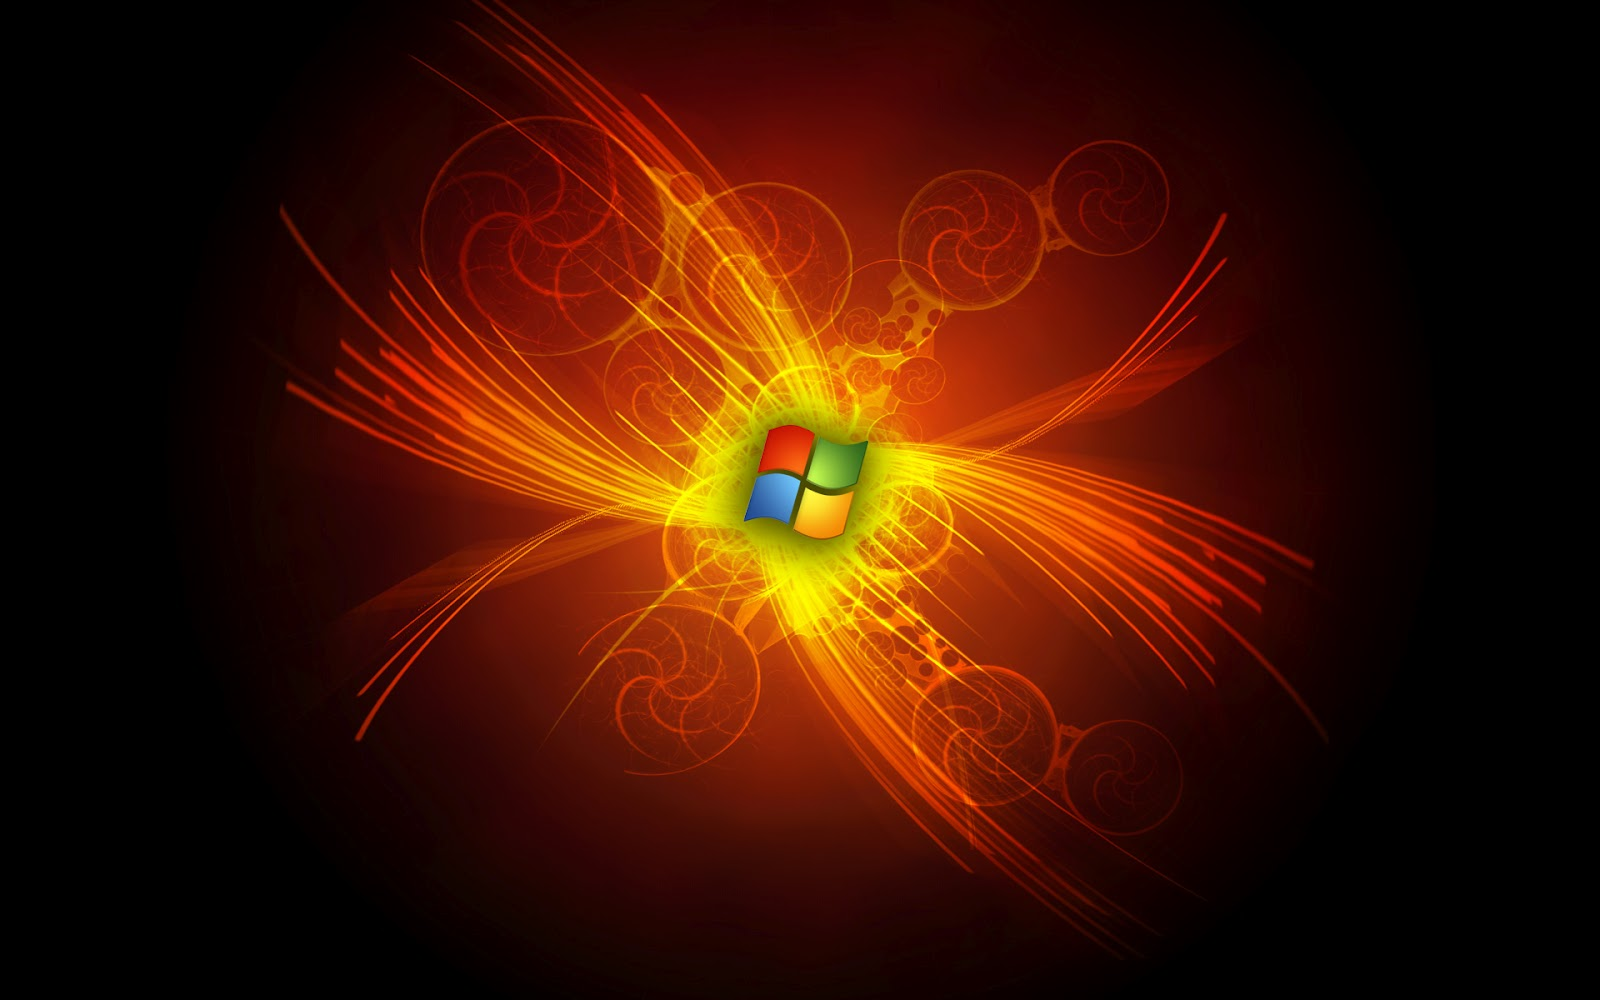 Windows 7 HD Wallpapers Free Download ~ SEO Urdu Pakistan   Blogging Techniques   Latest Jobs in ...